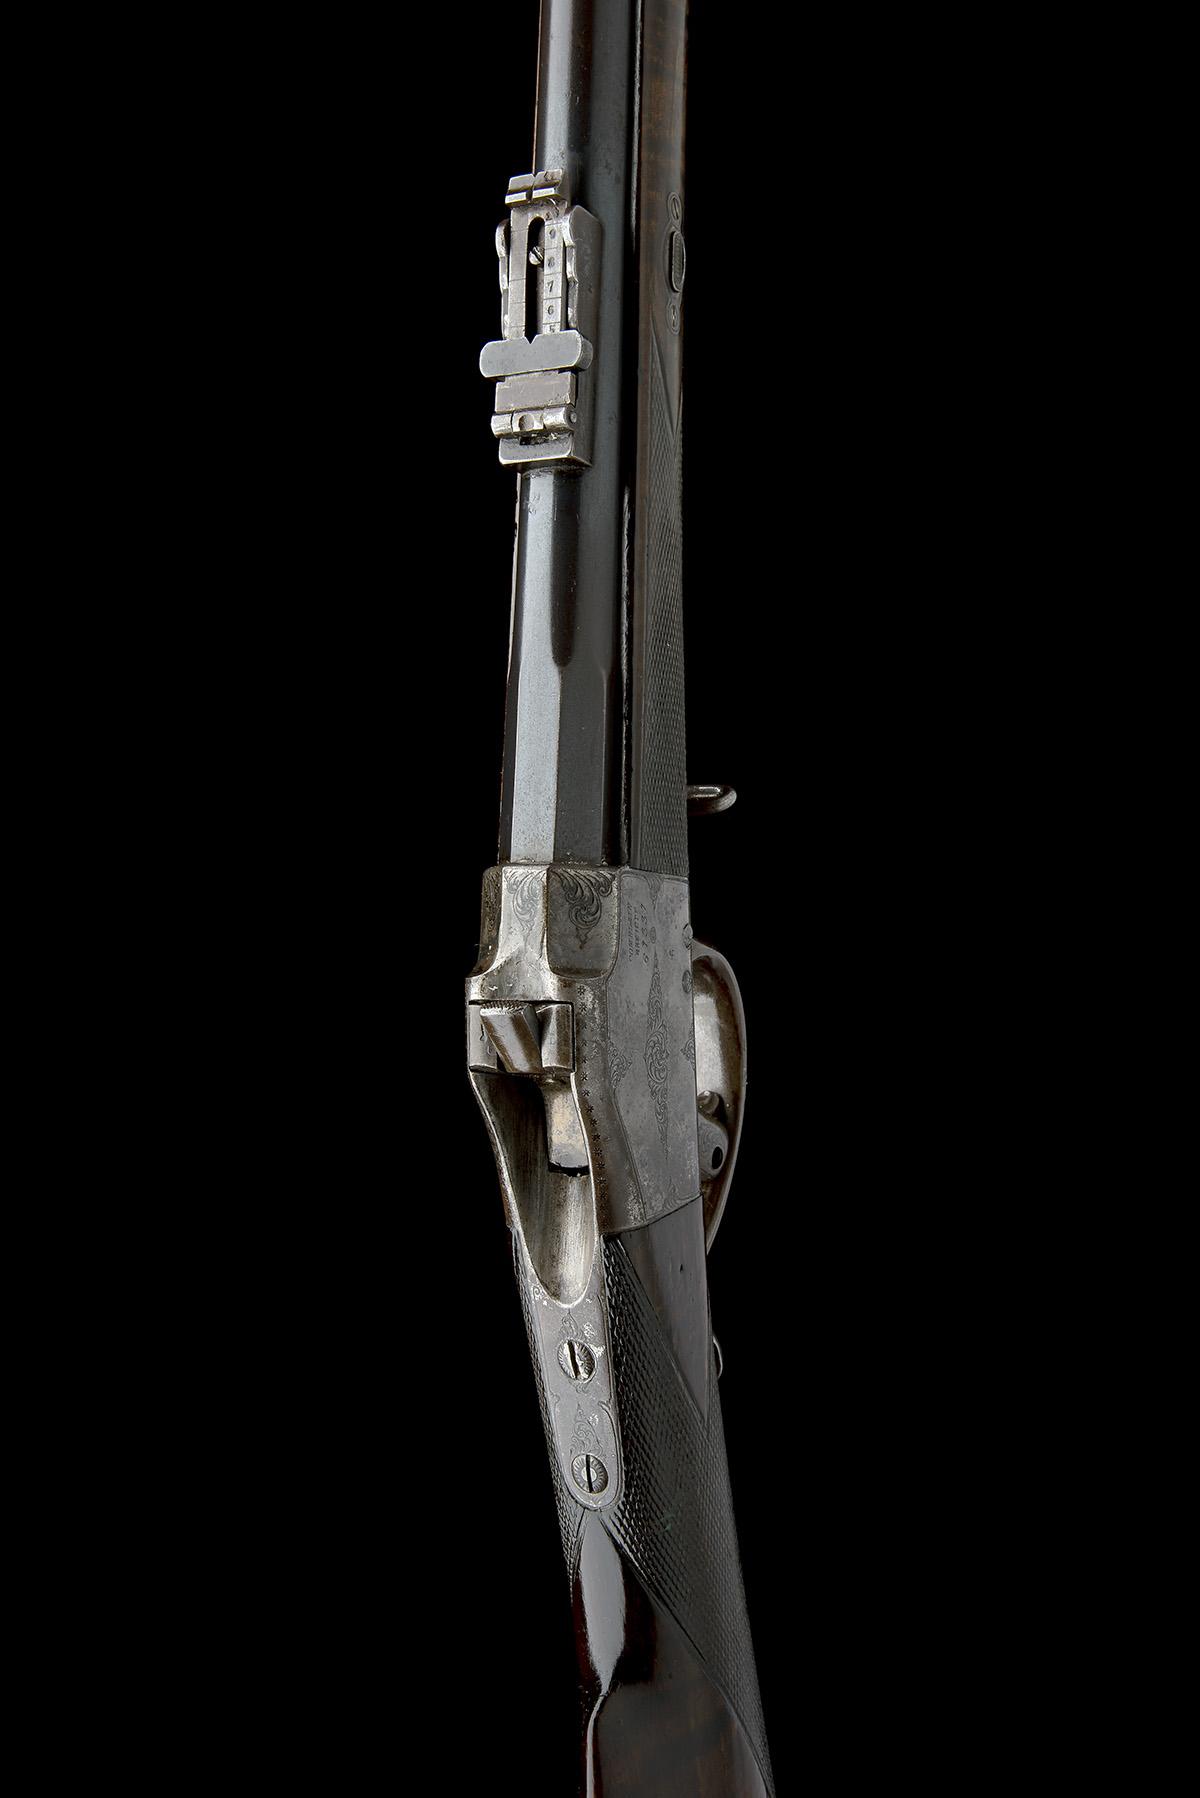 CHILEAN COMBLAIN AN 11x50R SINGLE-SHOT FALLING-BLOCK SPORTING-RIFLE, UNSIGNED, MODEL 'M84 COMBLAIN - Image 6 of 9